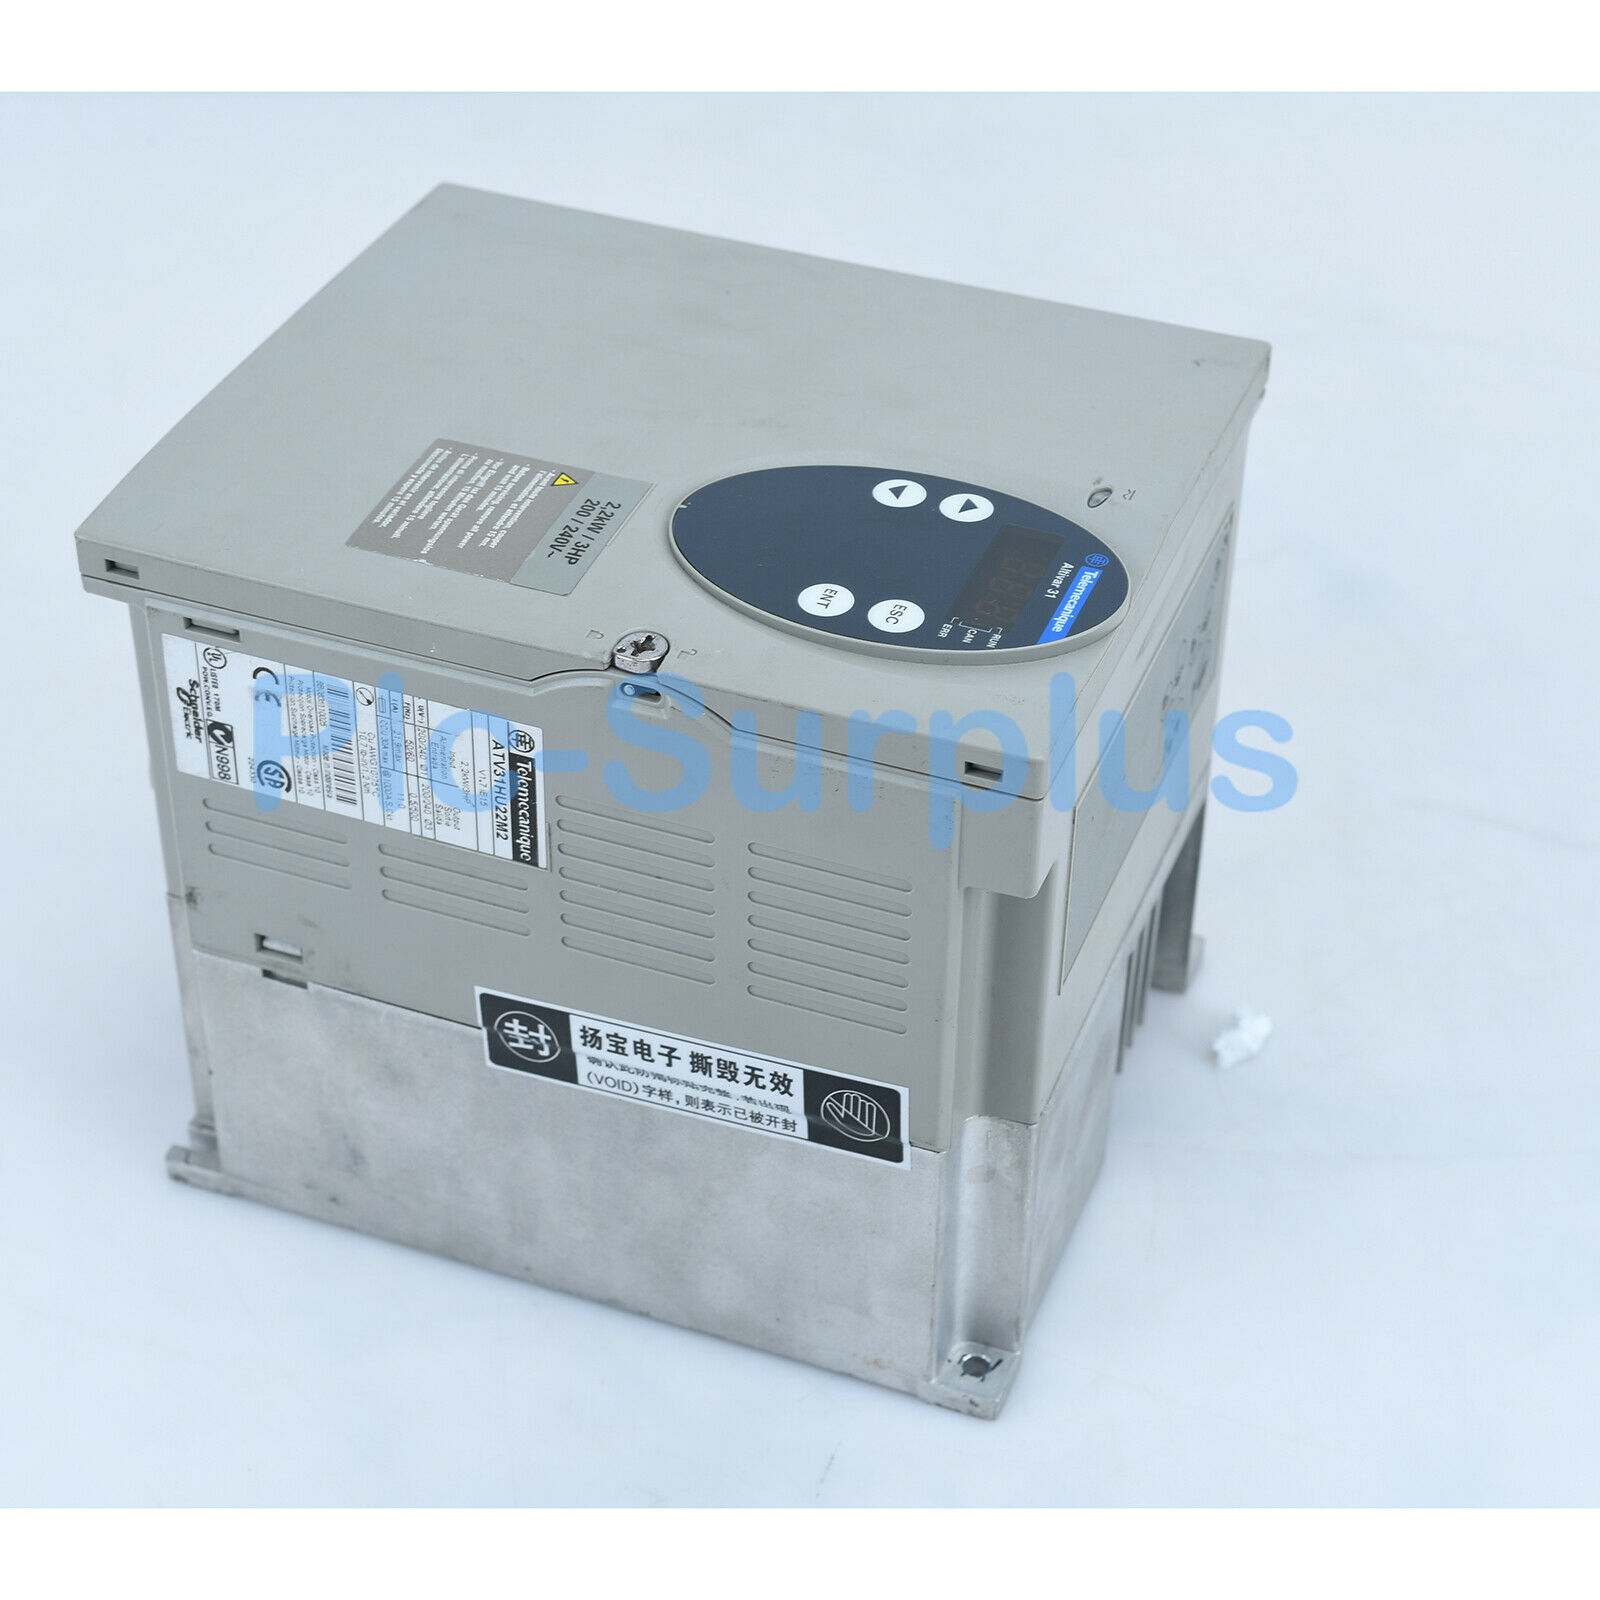 1PC Used Schneider inverter ATV31 2.2KW 200V//240V 3HP ATV31HU22M2A Tested Fully